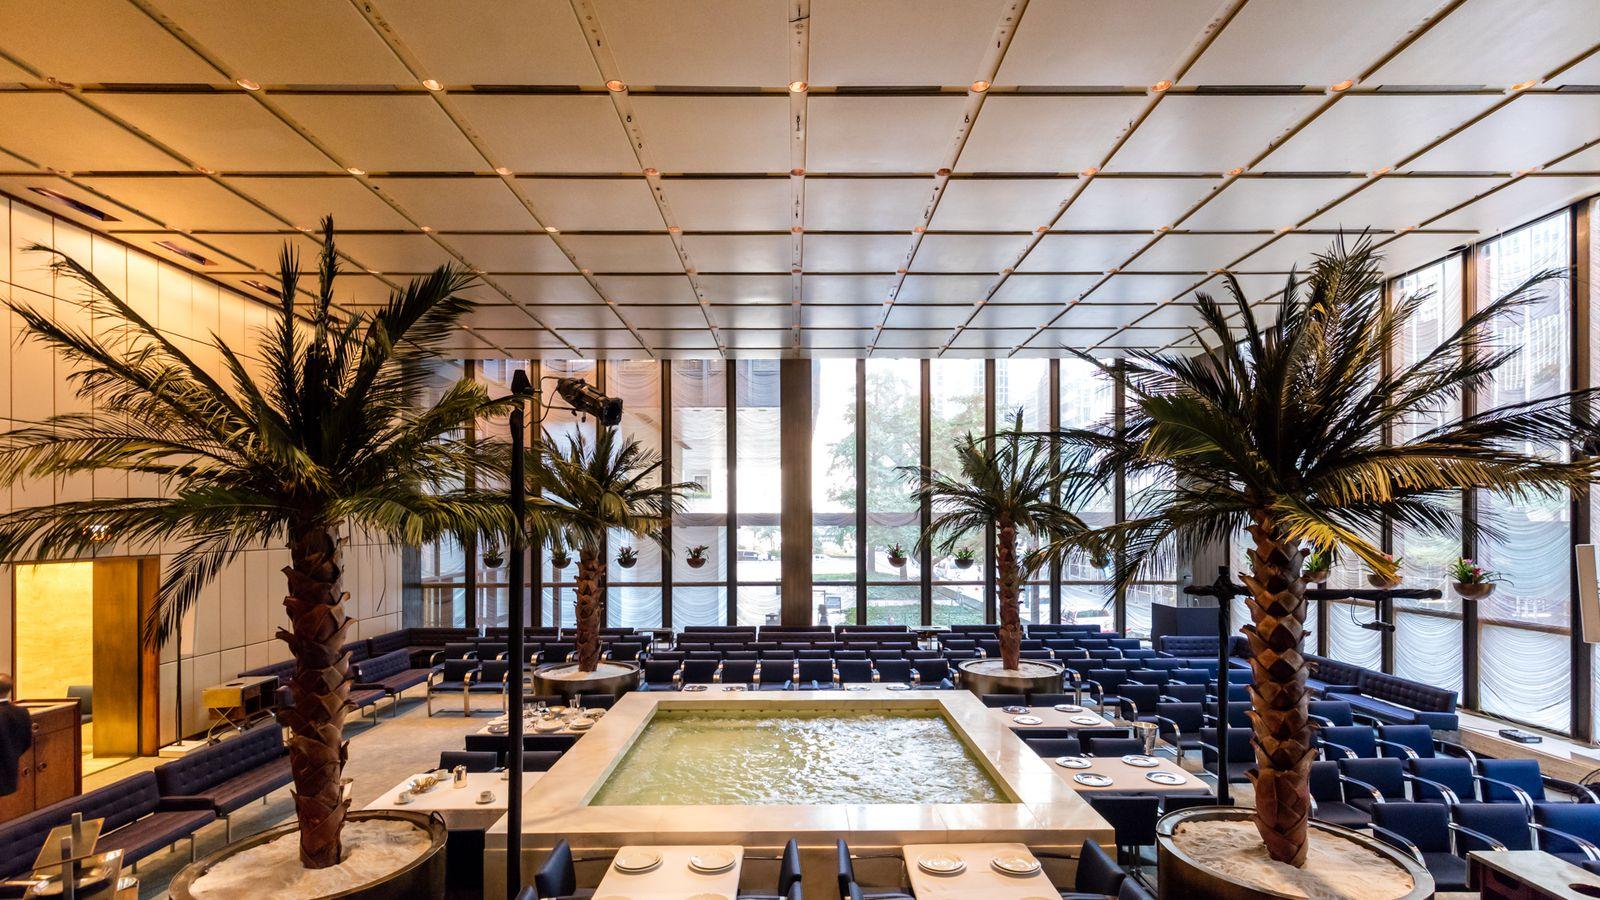 The Four Seasons Restaurant S Midcentury Modern Interiors